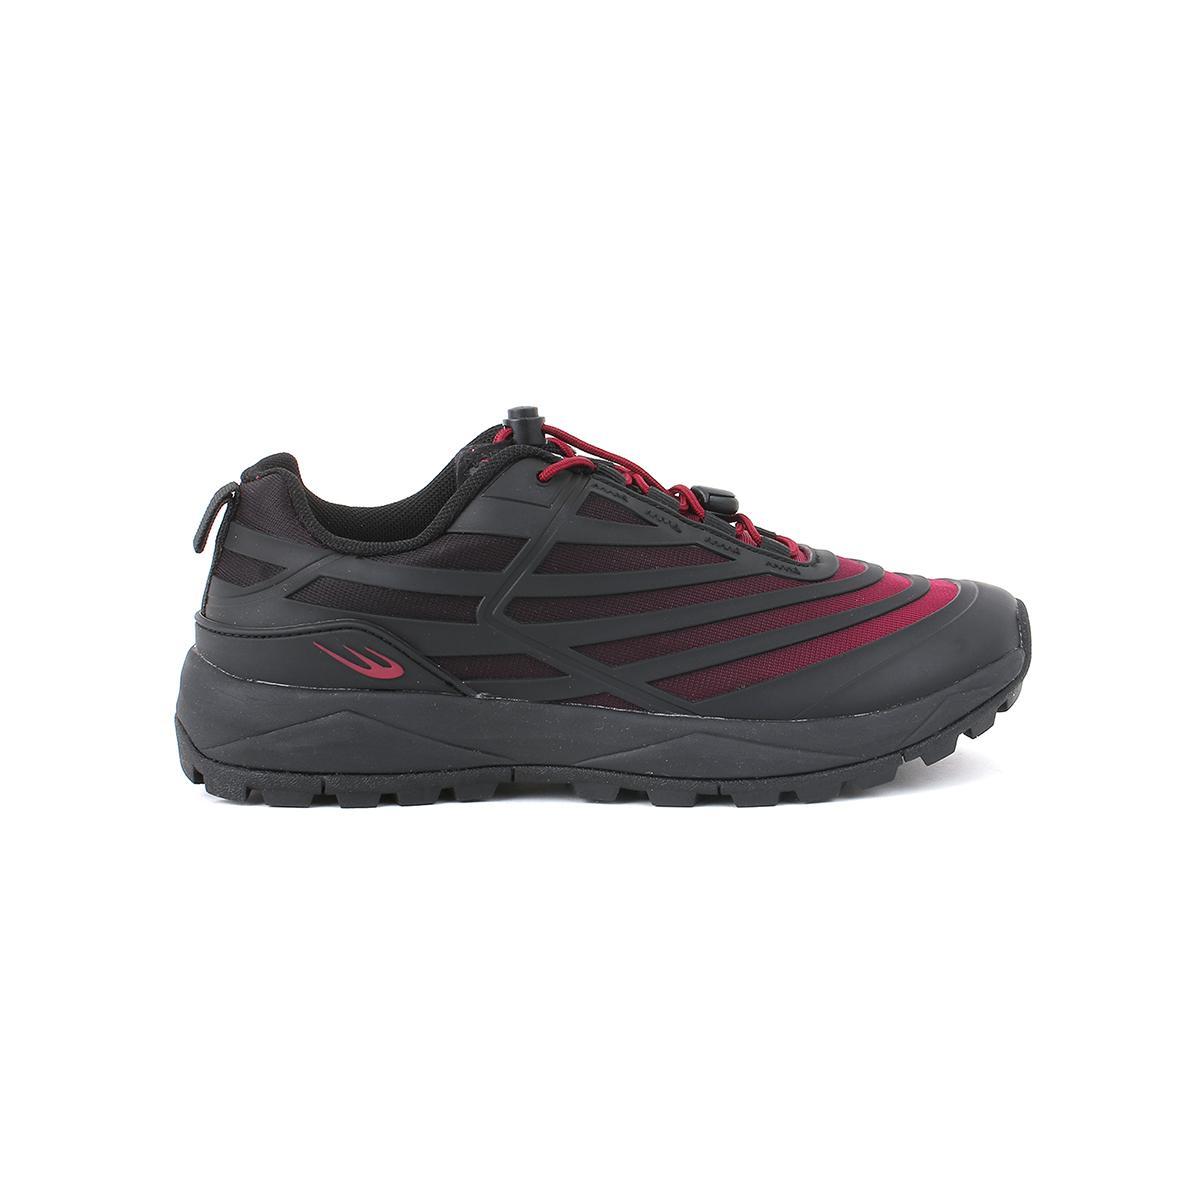 Buy World Balance Hiking Shoes Online